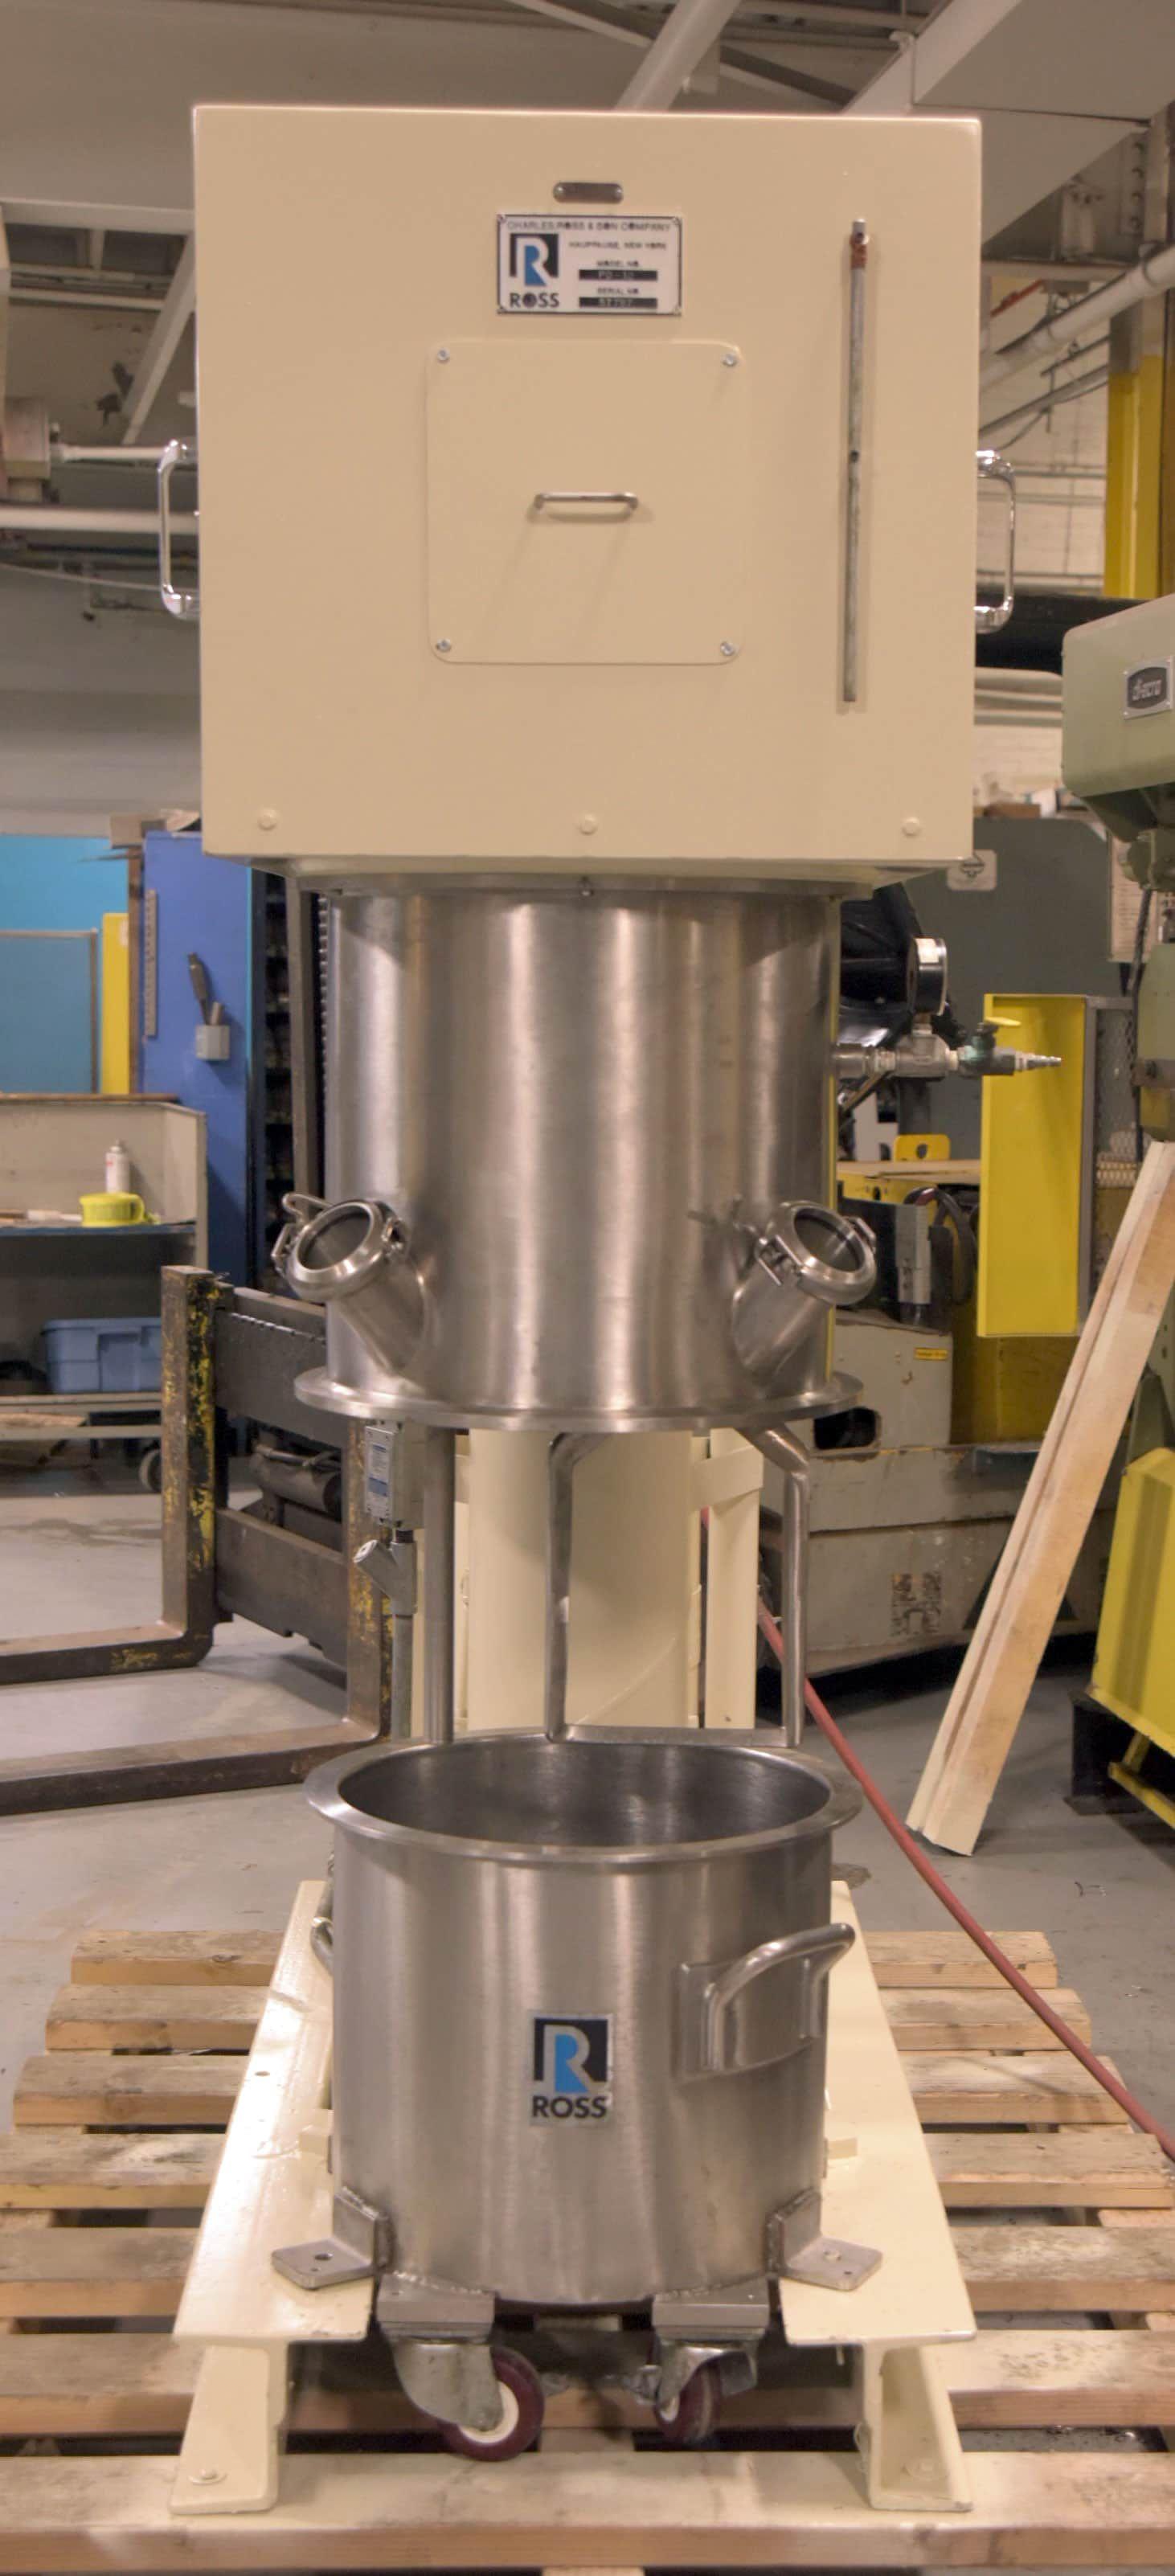 Refurbished Ross Powermix, PD-10 Gallon High-Shear Planetary Mixer & Optional Discharge Press